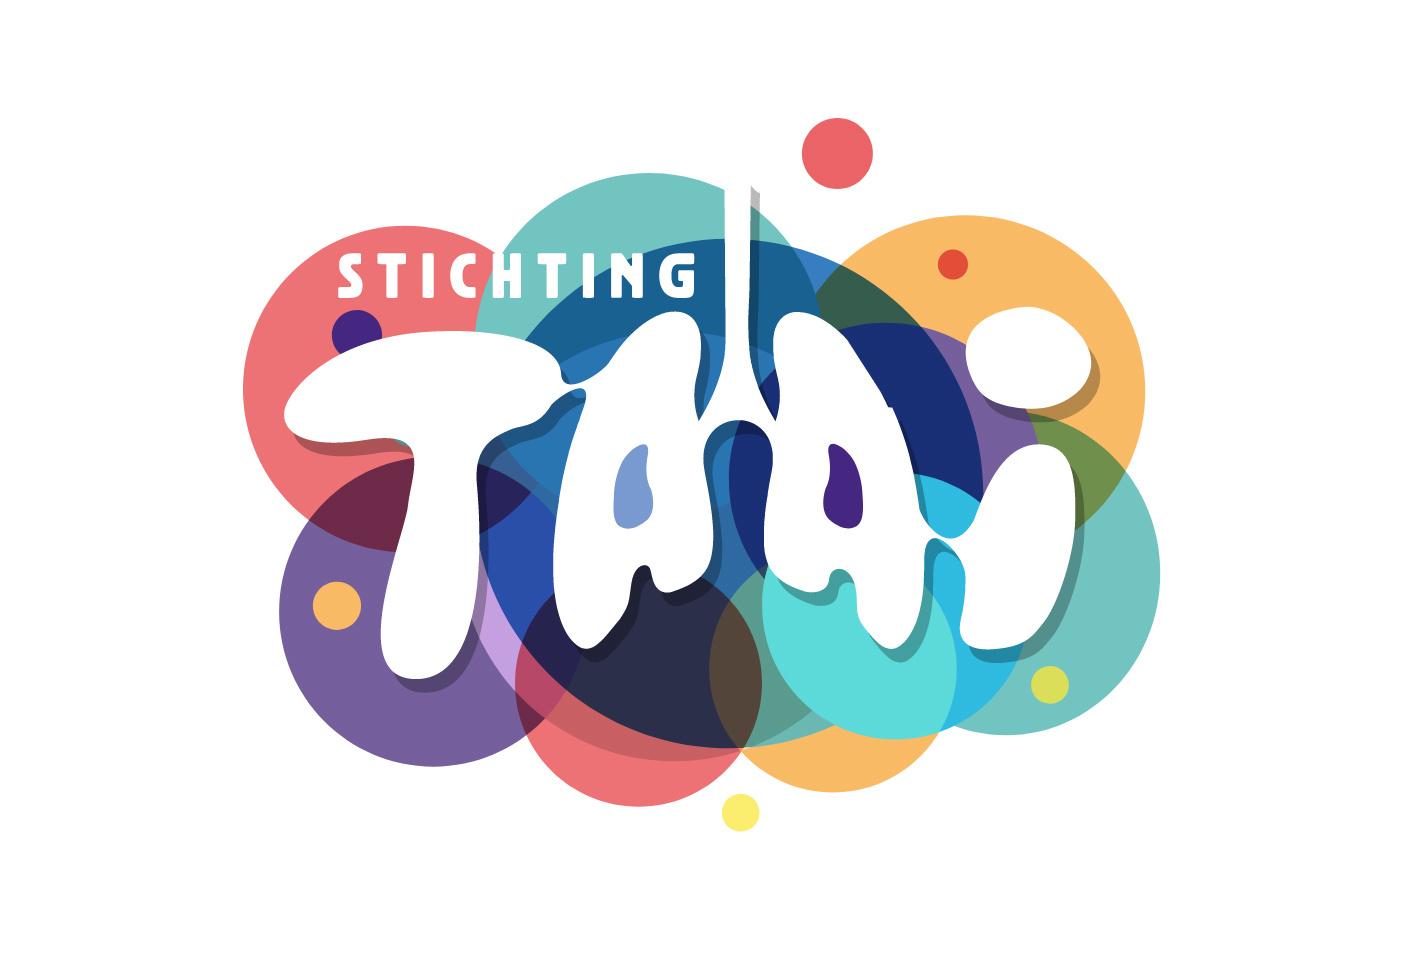 Stichting TAAI